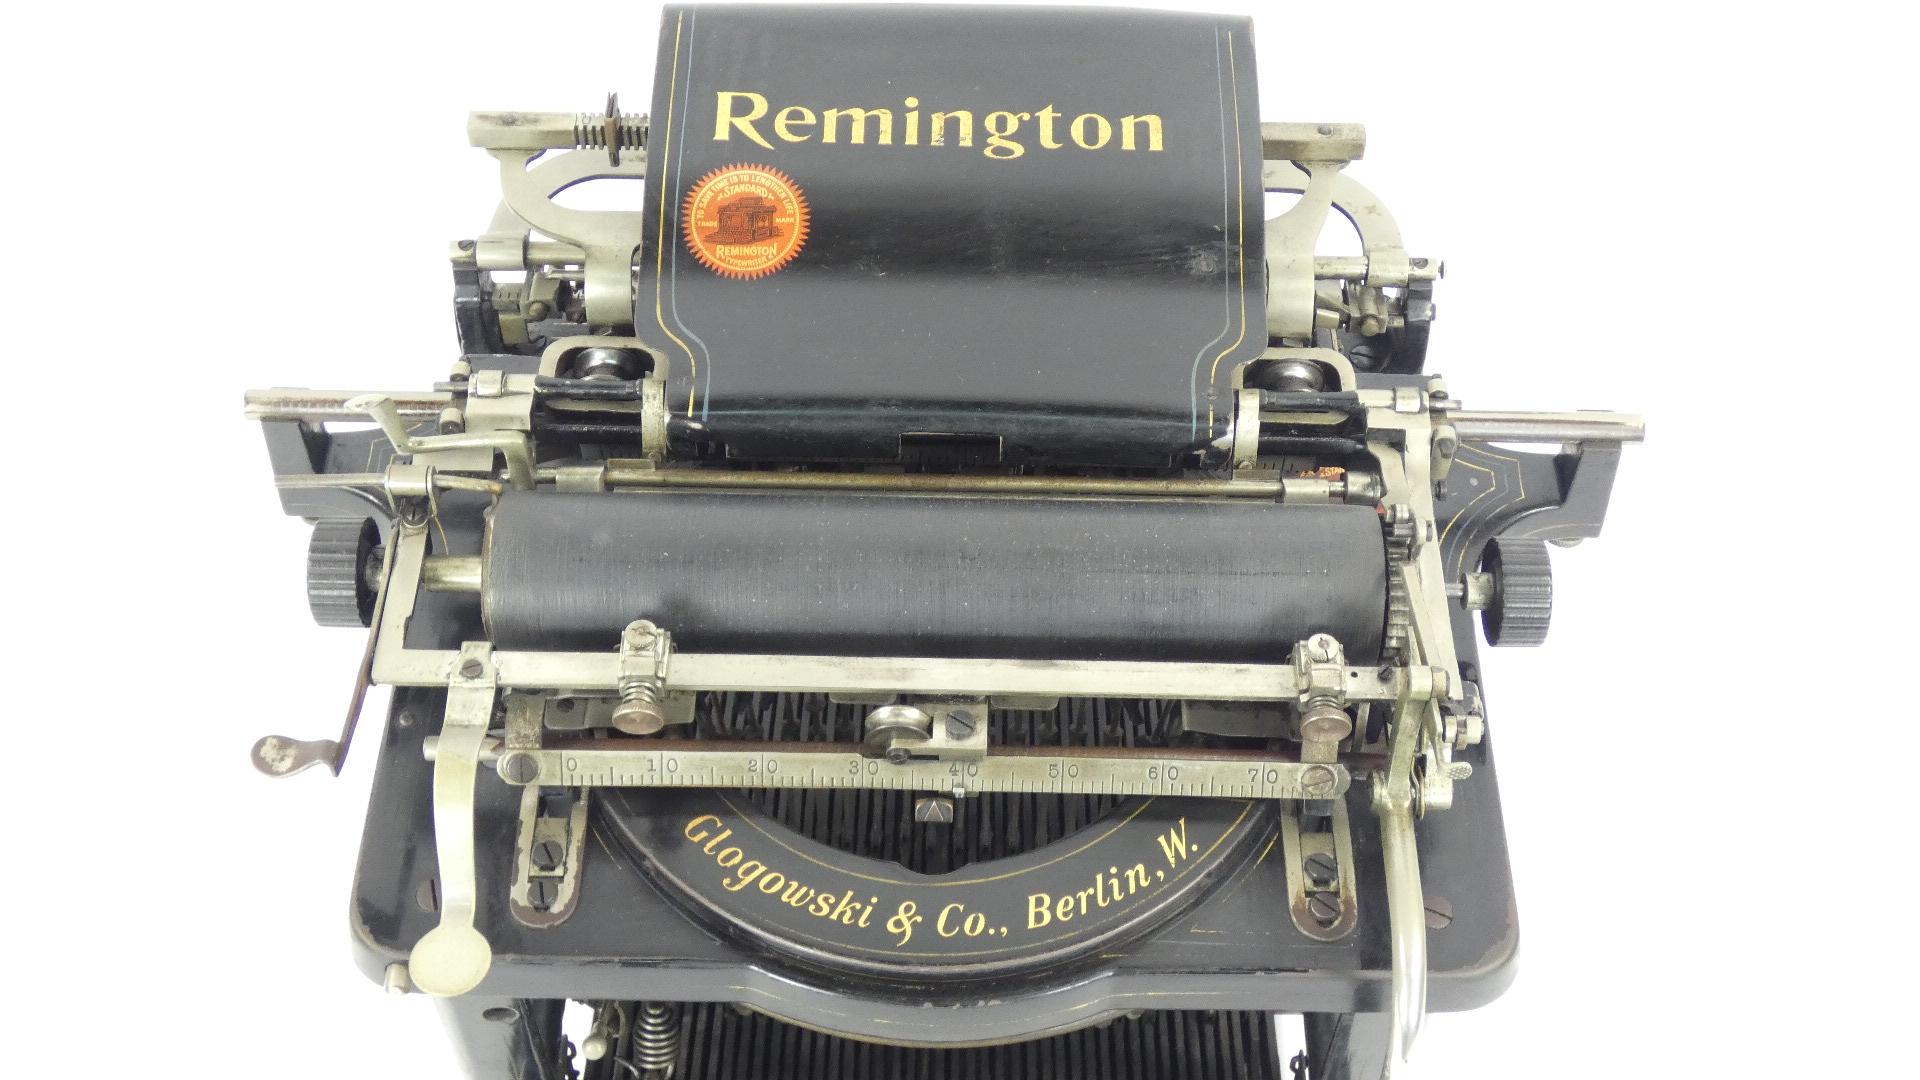 Imagen REMINGTON Nº7 + TABULADOR  AÑO 1898 43419